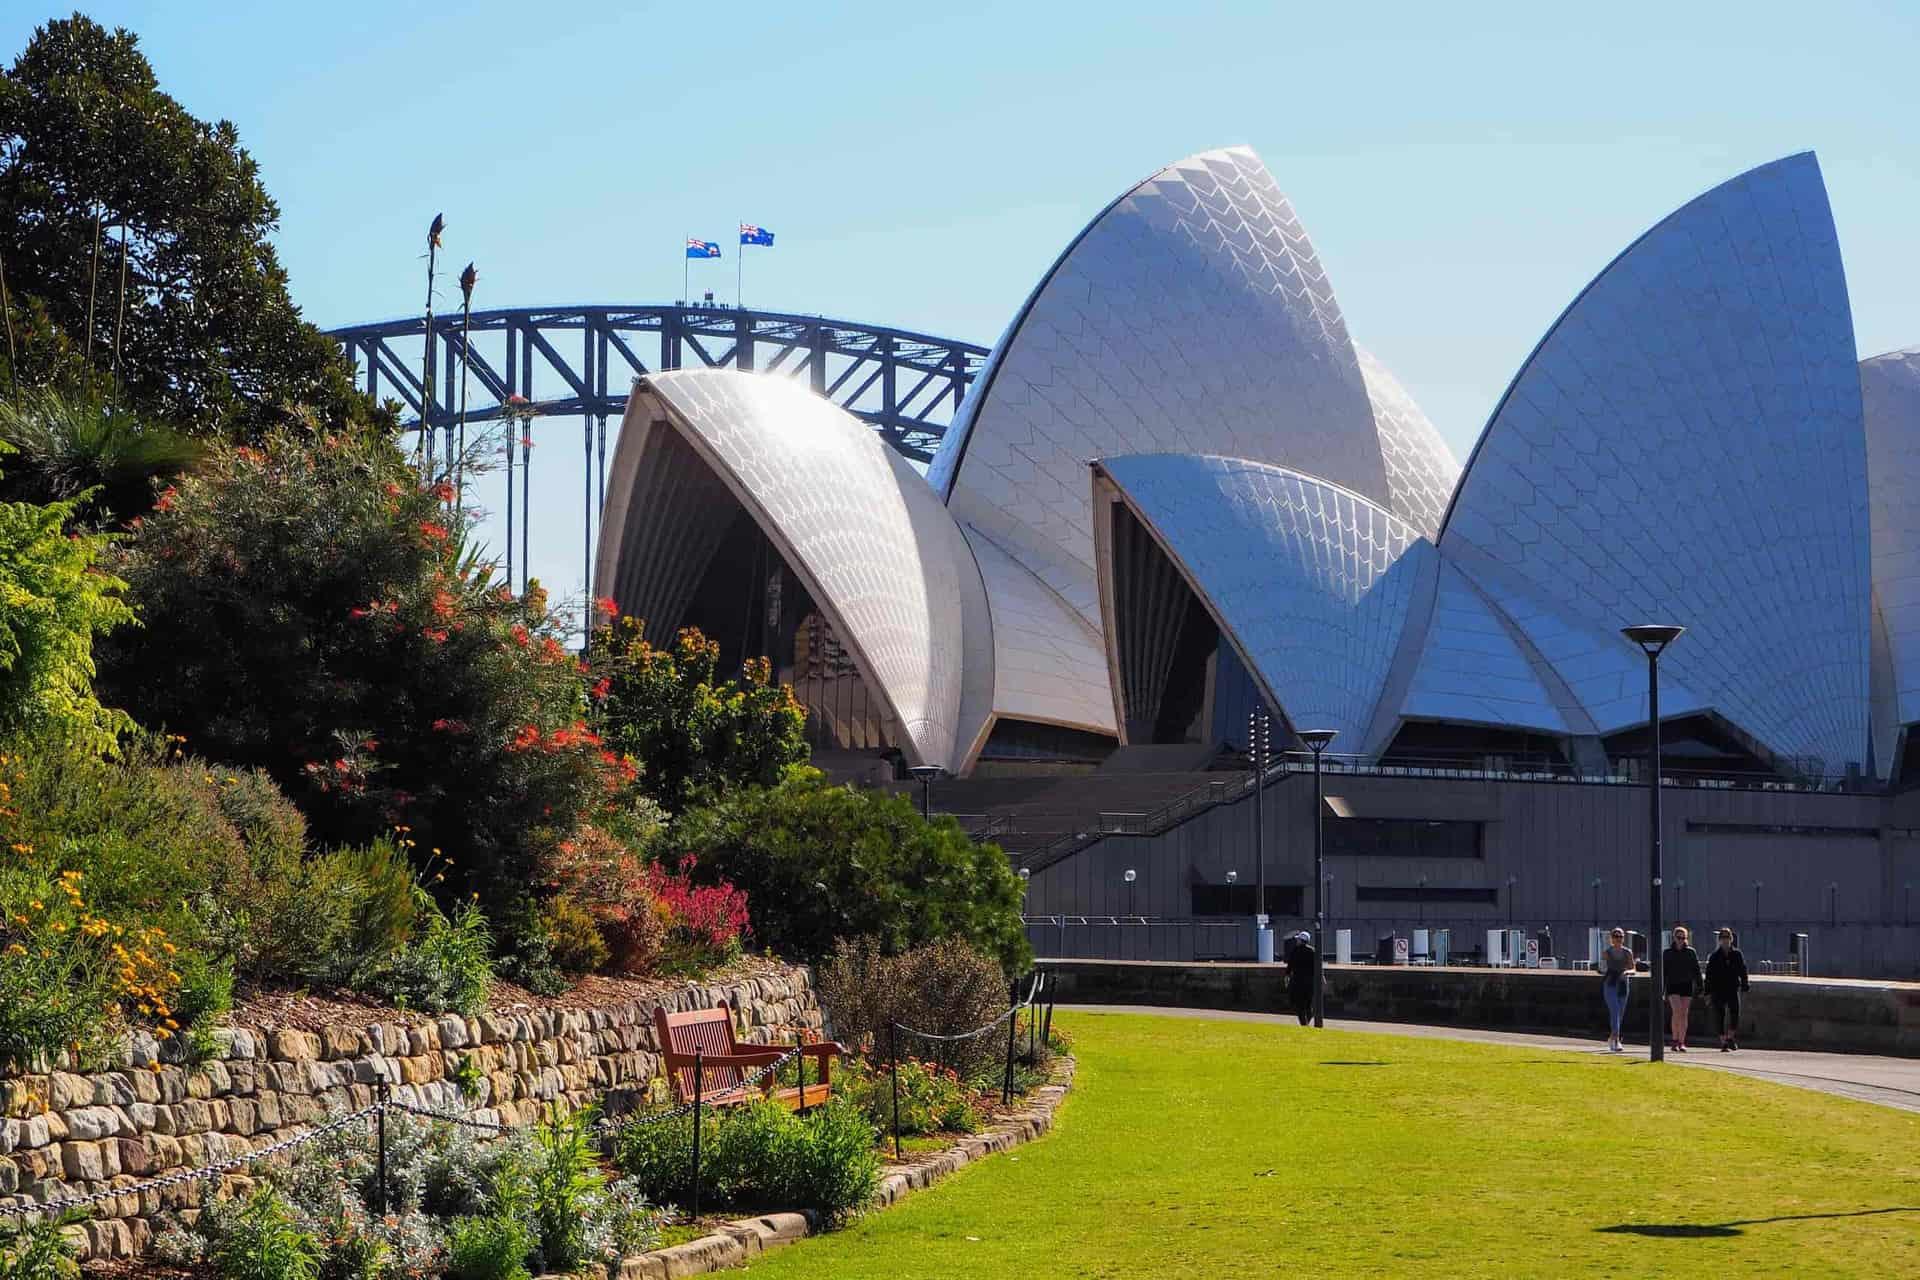 Royal Botanic Garden, Sydney Opera House and Sydney Harbour Bridge, Quay People walking tour - Local Travel Planner